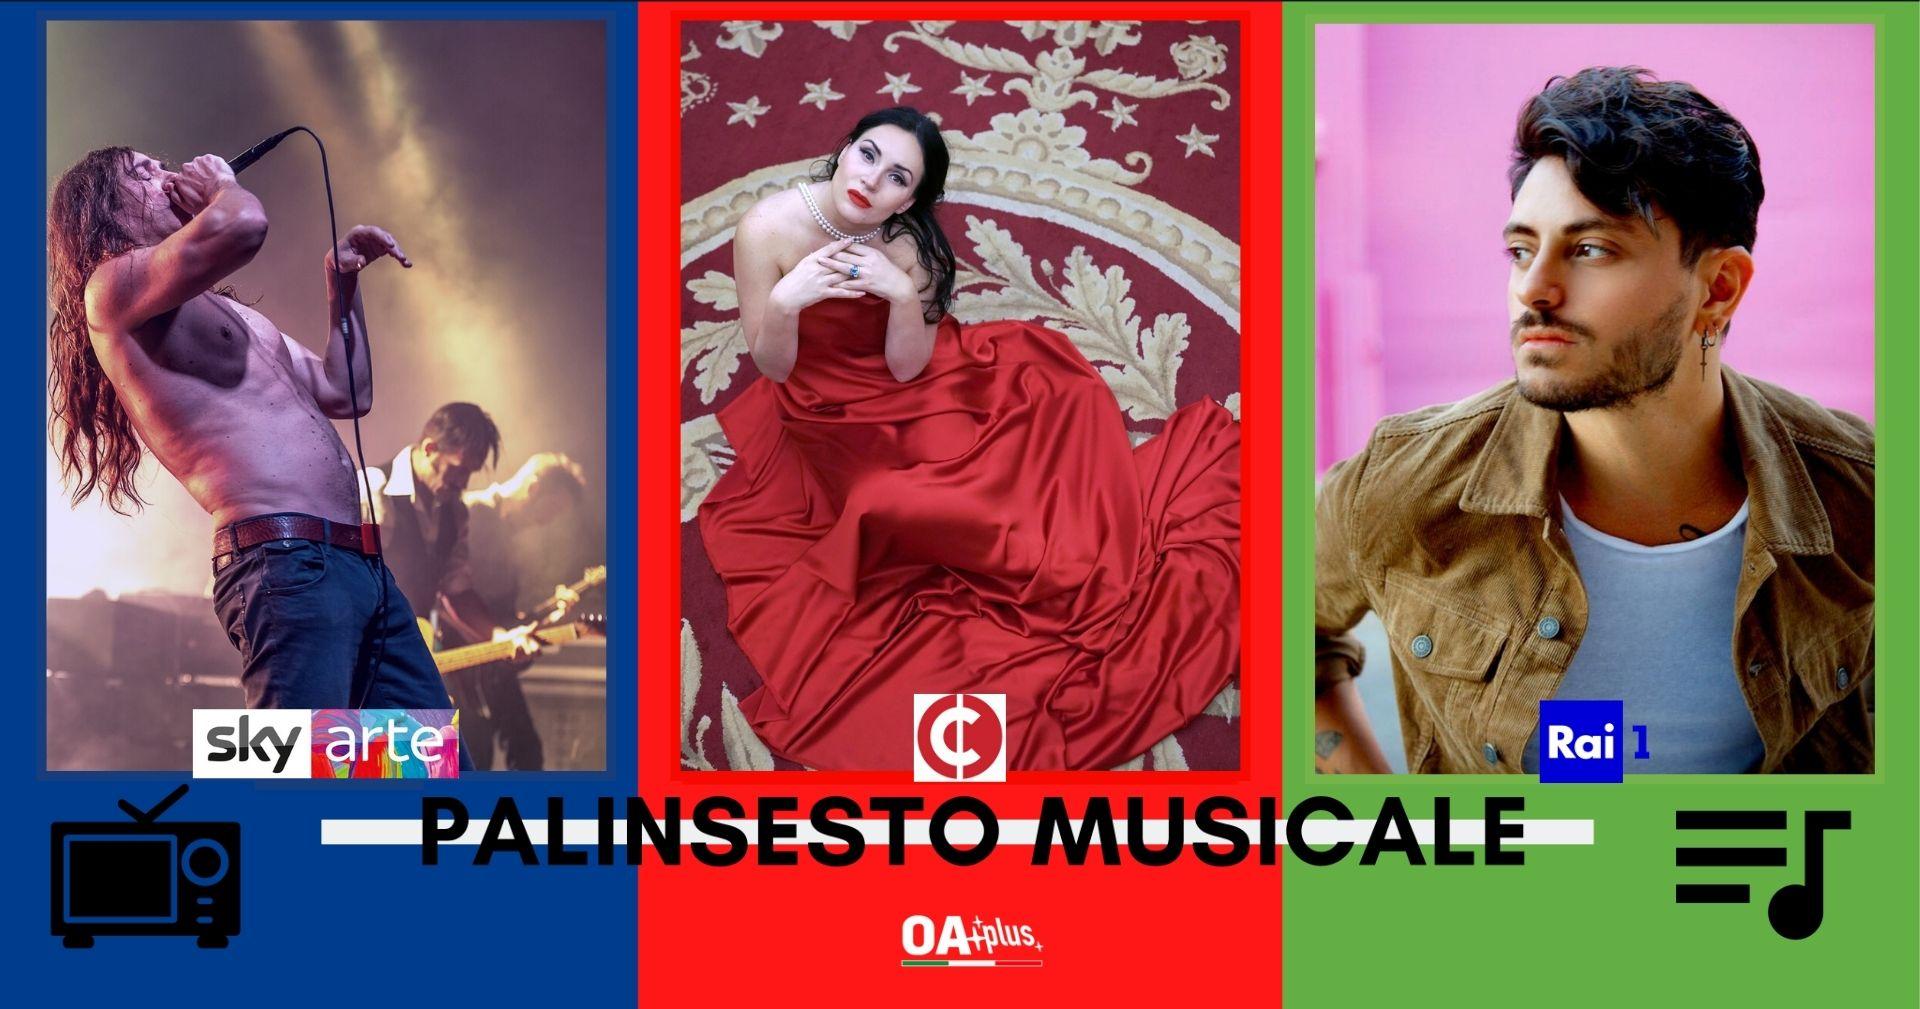 Rubrica, PALINSESTO MUSICALE: Afterhours, Sonya Yoncheva, Tale e Quale Show